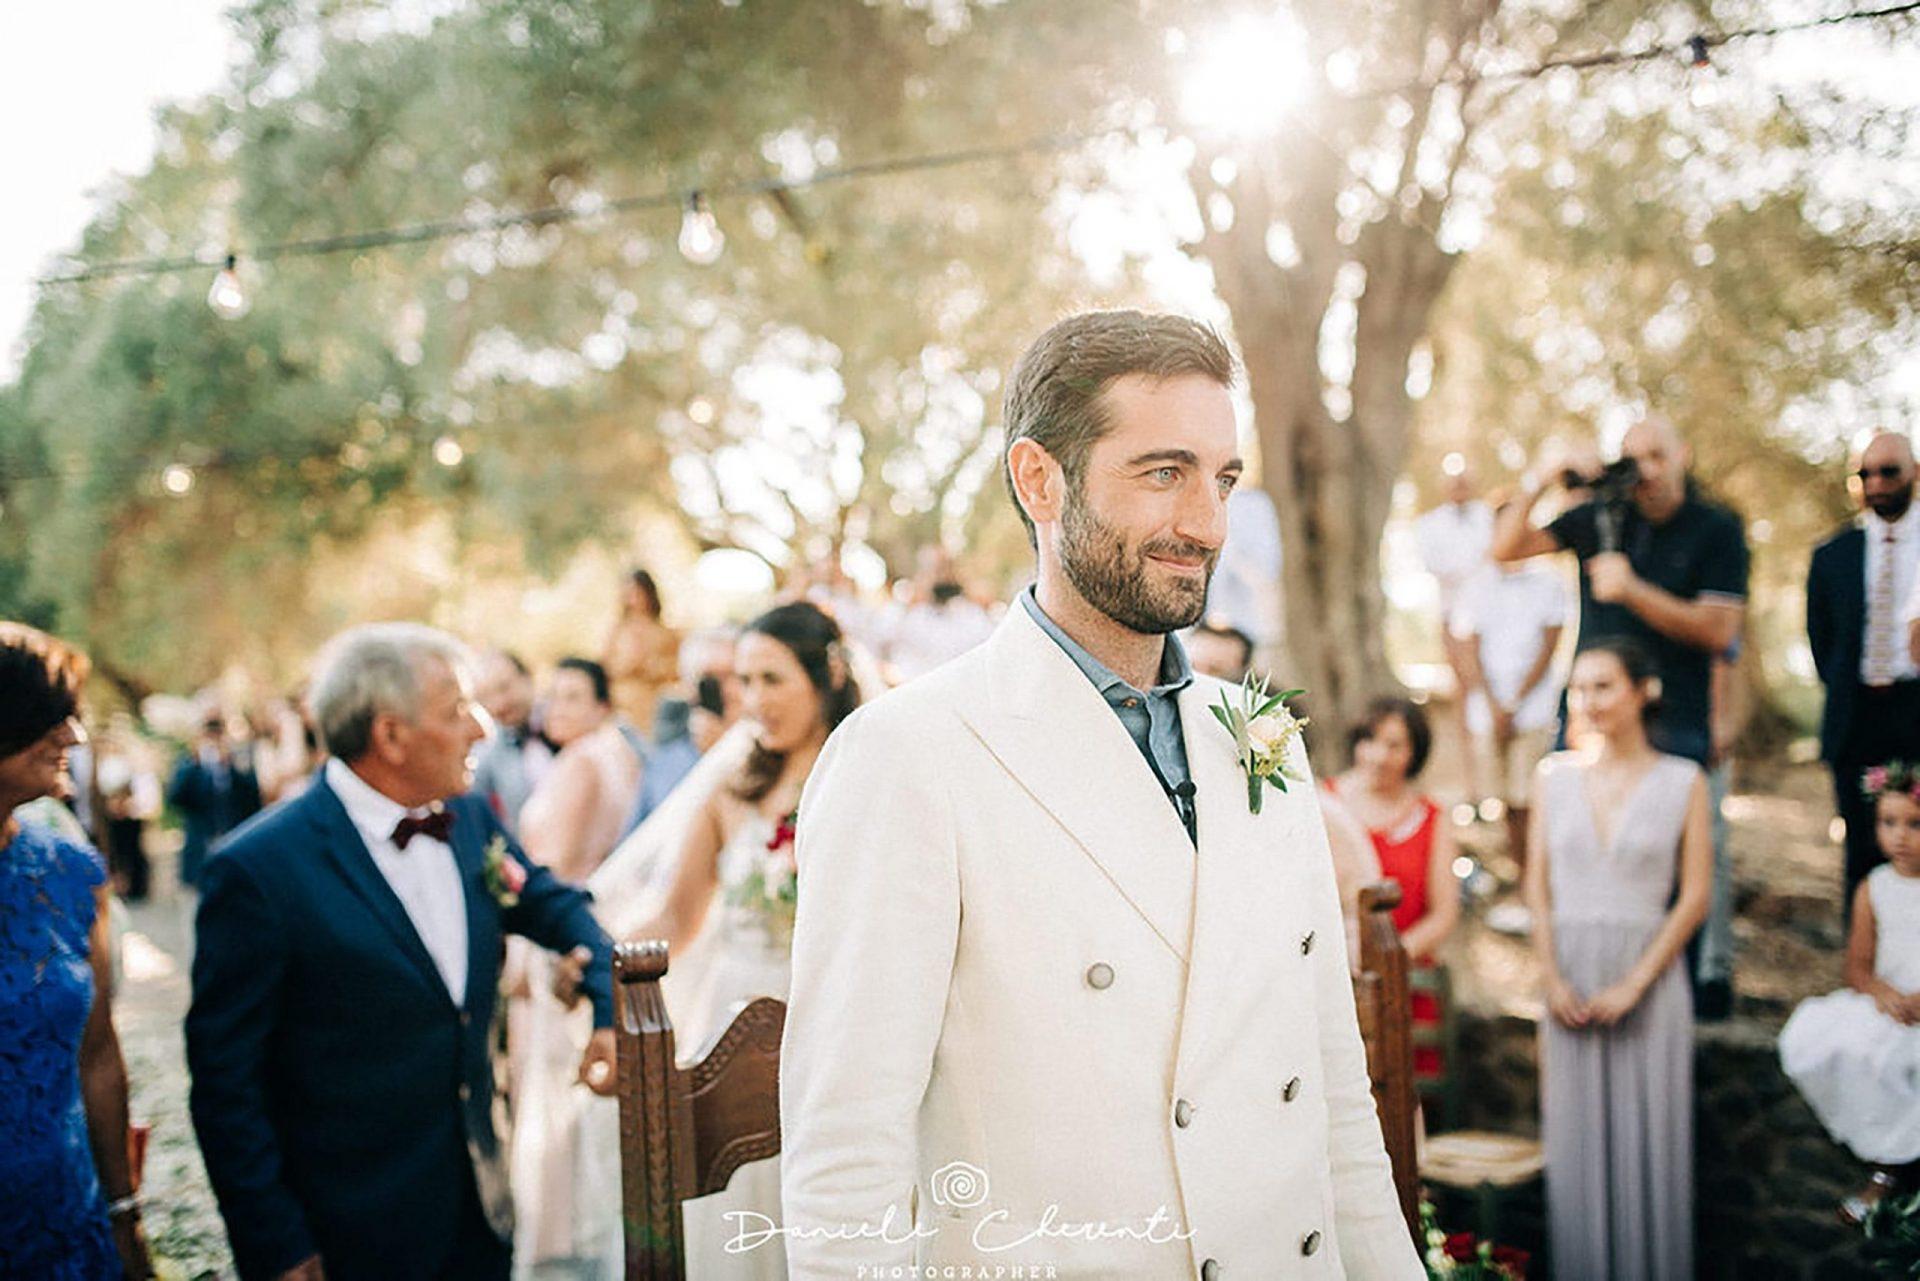 Marianna & Matteo, the groom